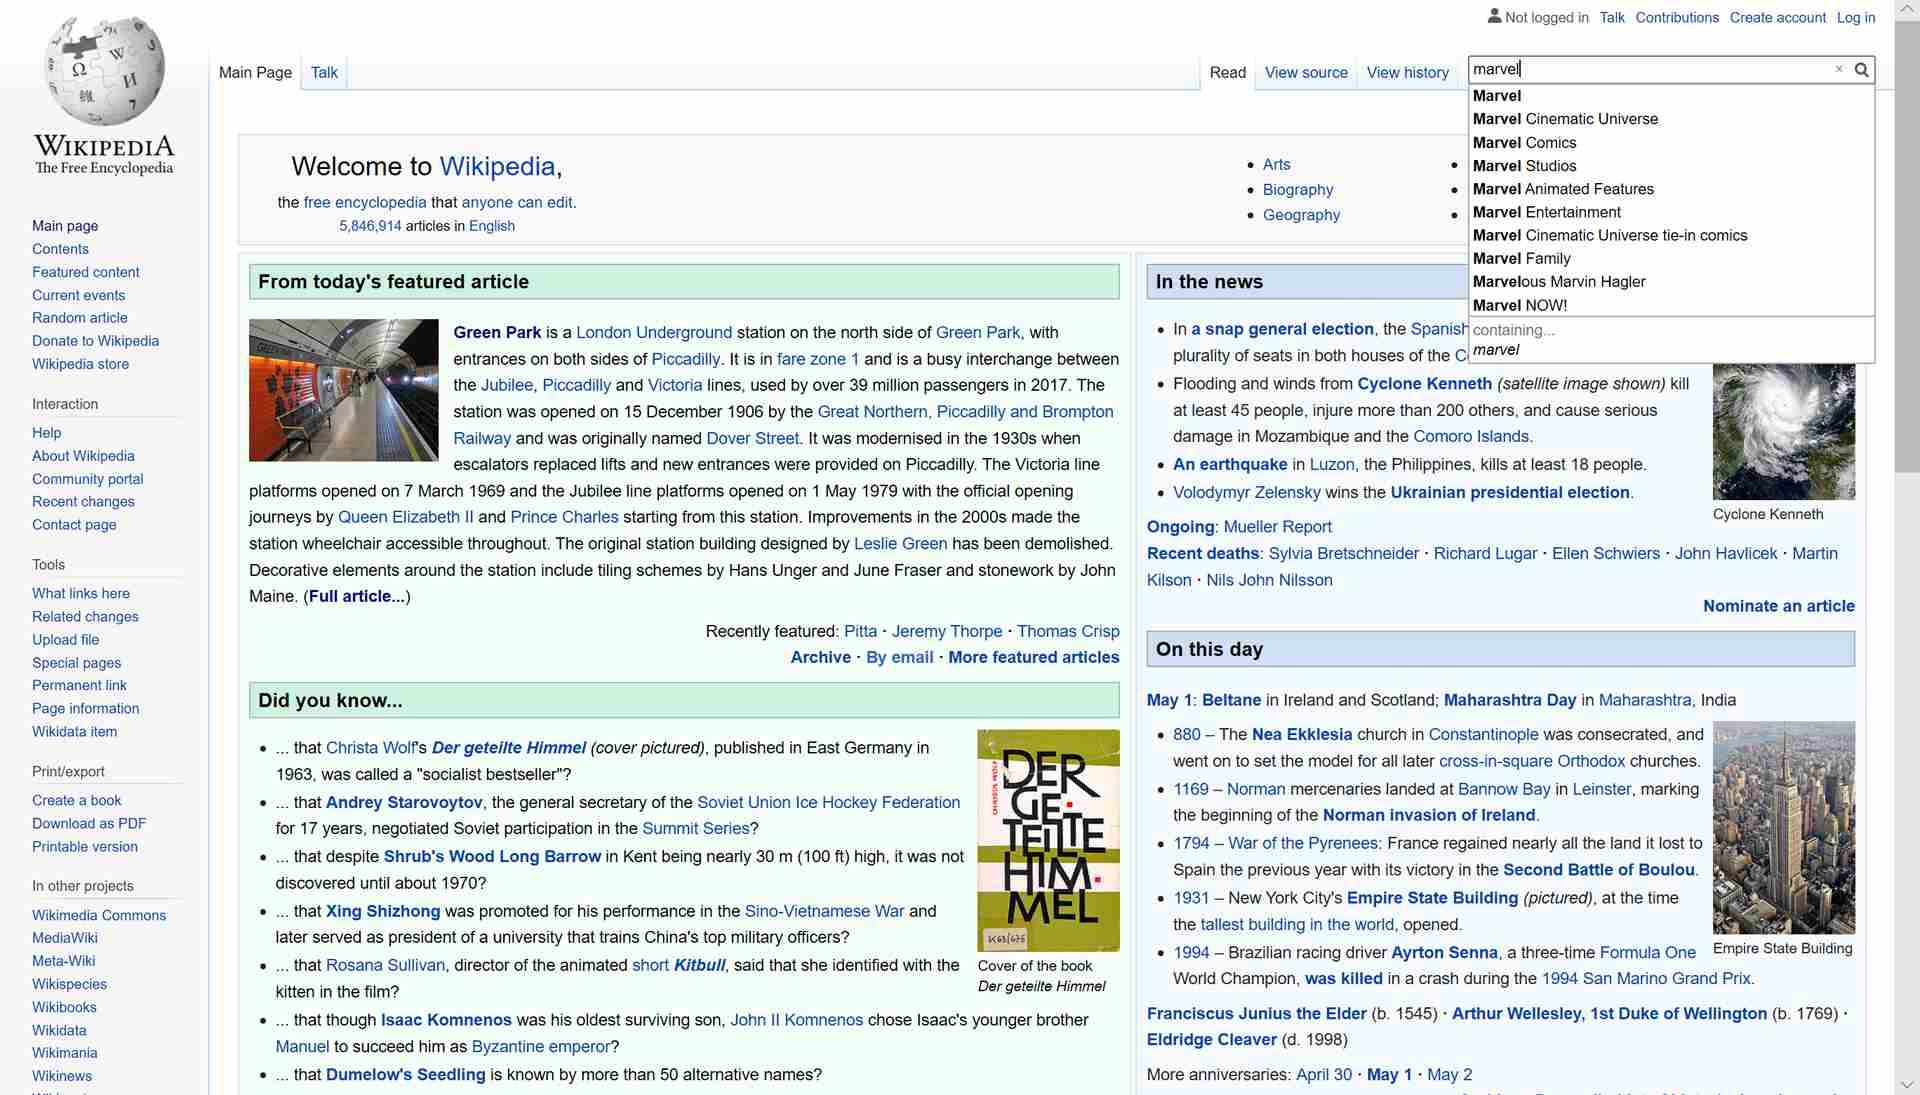 Wiklipedia search suggestions.